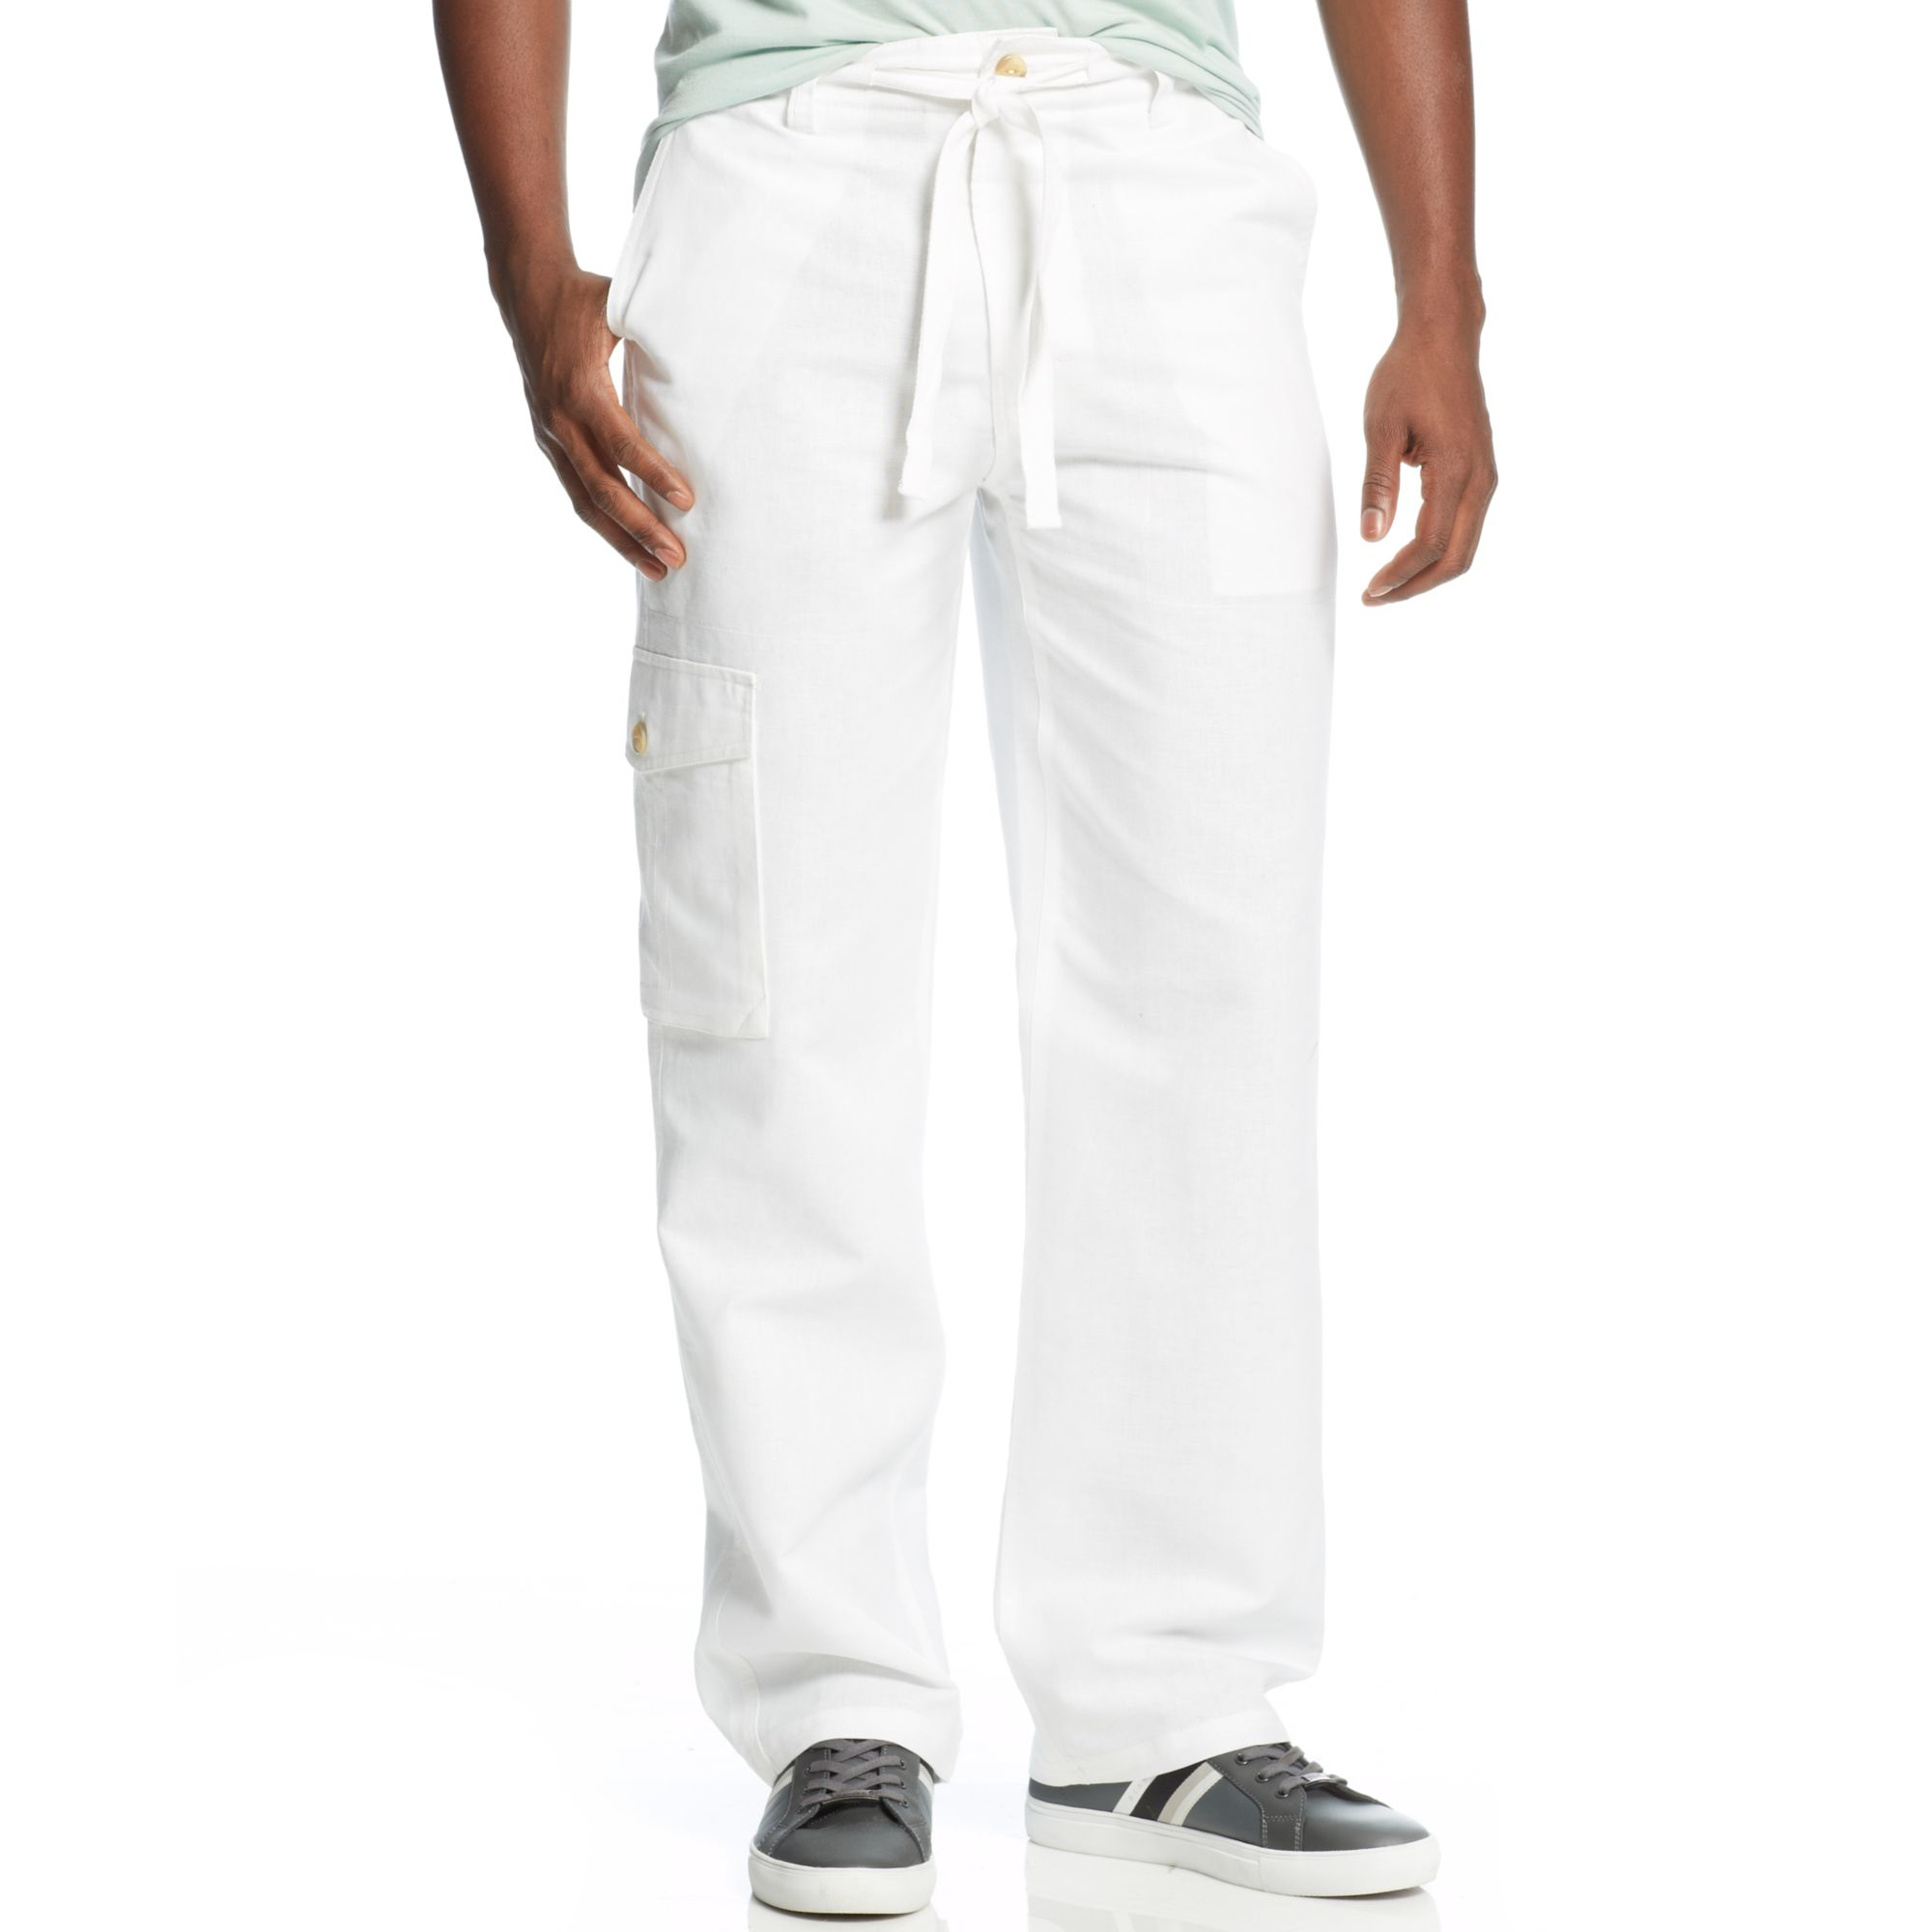 Mavi Jeans Men